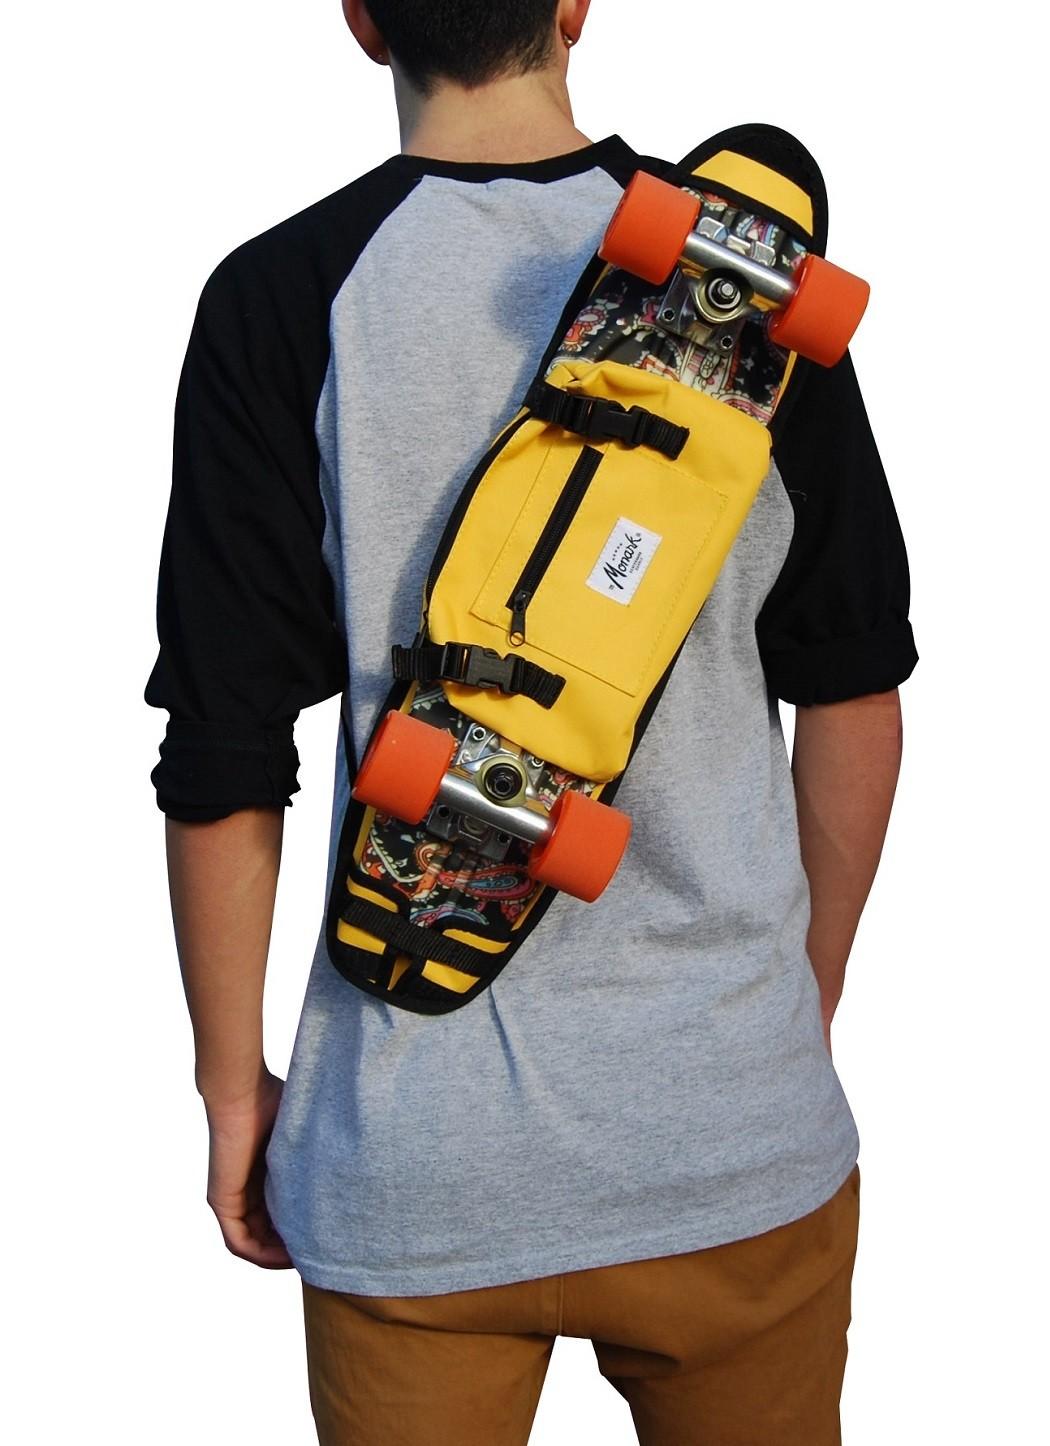 skate umh ngetasche bauchtasche handtasche und rucksack skateboardfahrer penny board. Black Bedroom Furniture Sets. Home Design Ideas